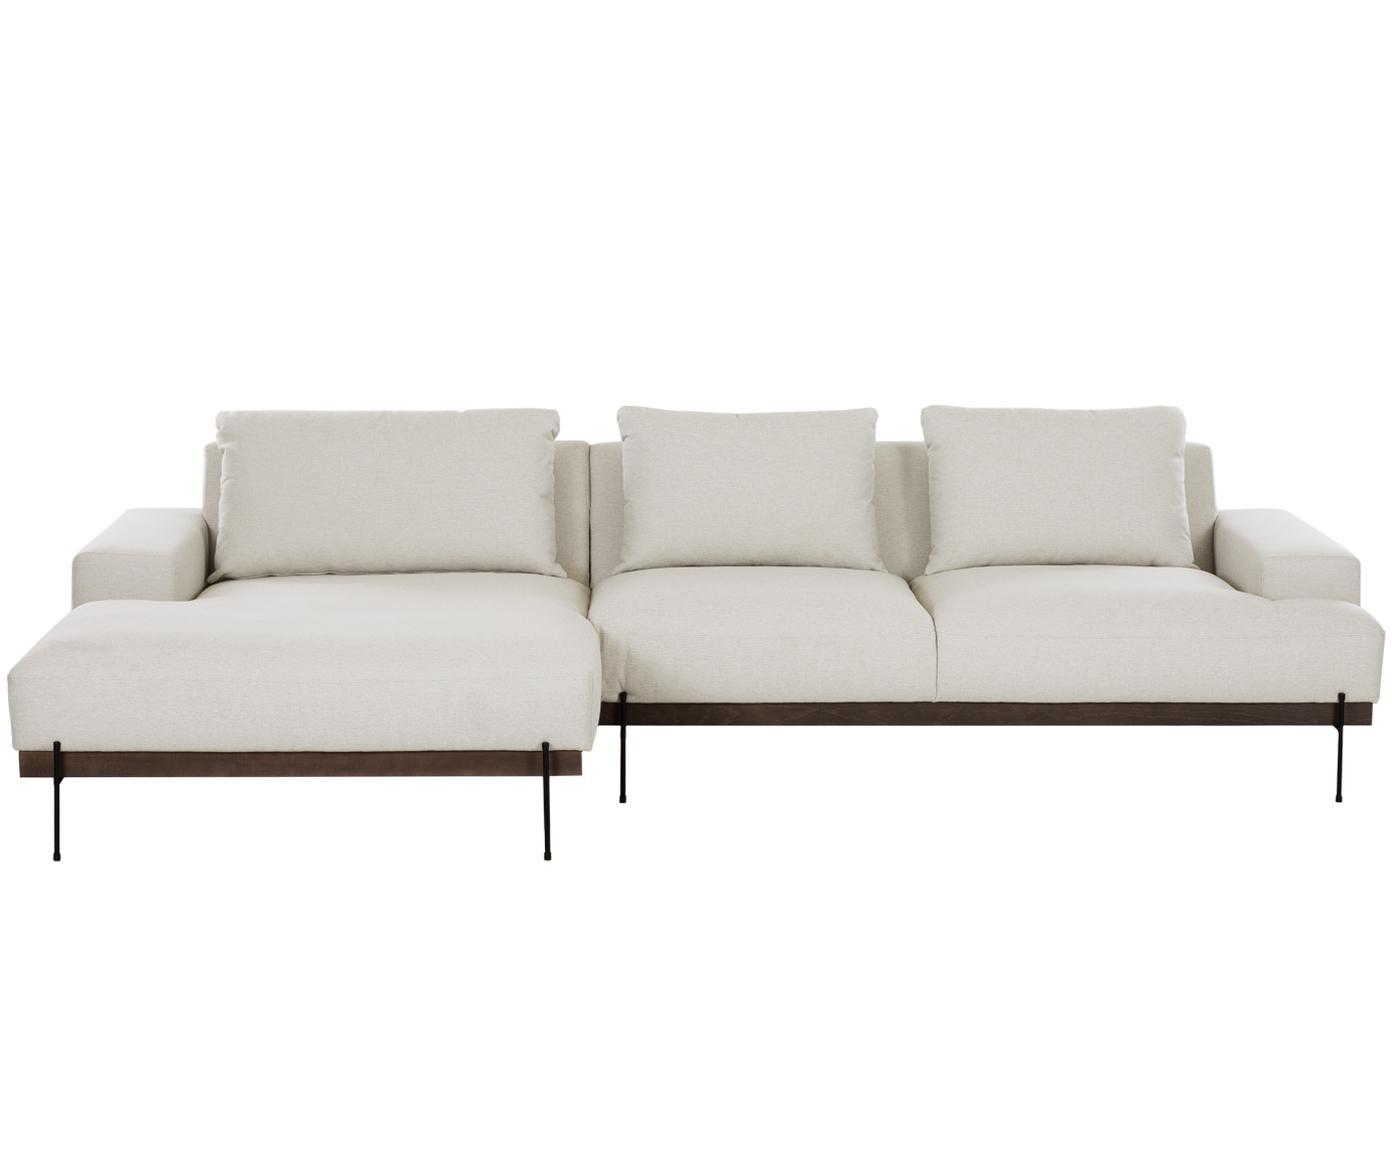 Hoekbank Brooks, Bekleding: polyester, Frame: gelakt grenenhout, Poten: gepoedercoat metaal, Beige, B 315 x D 148 cm